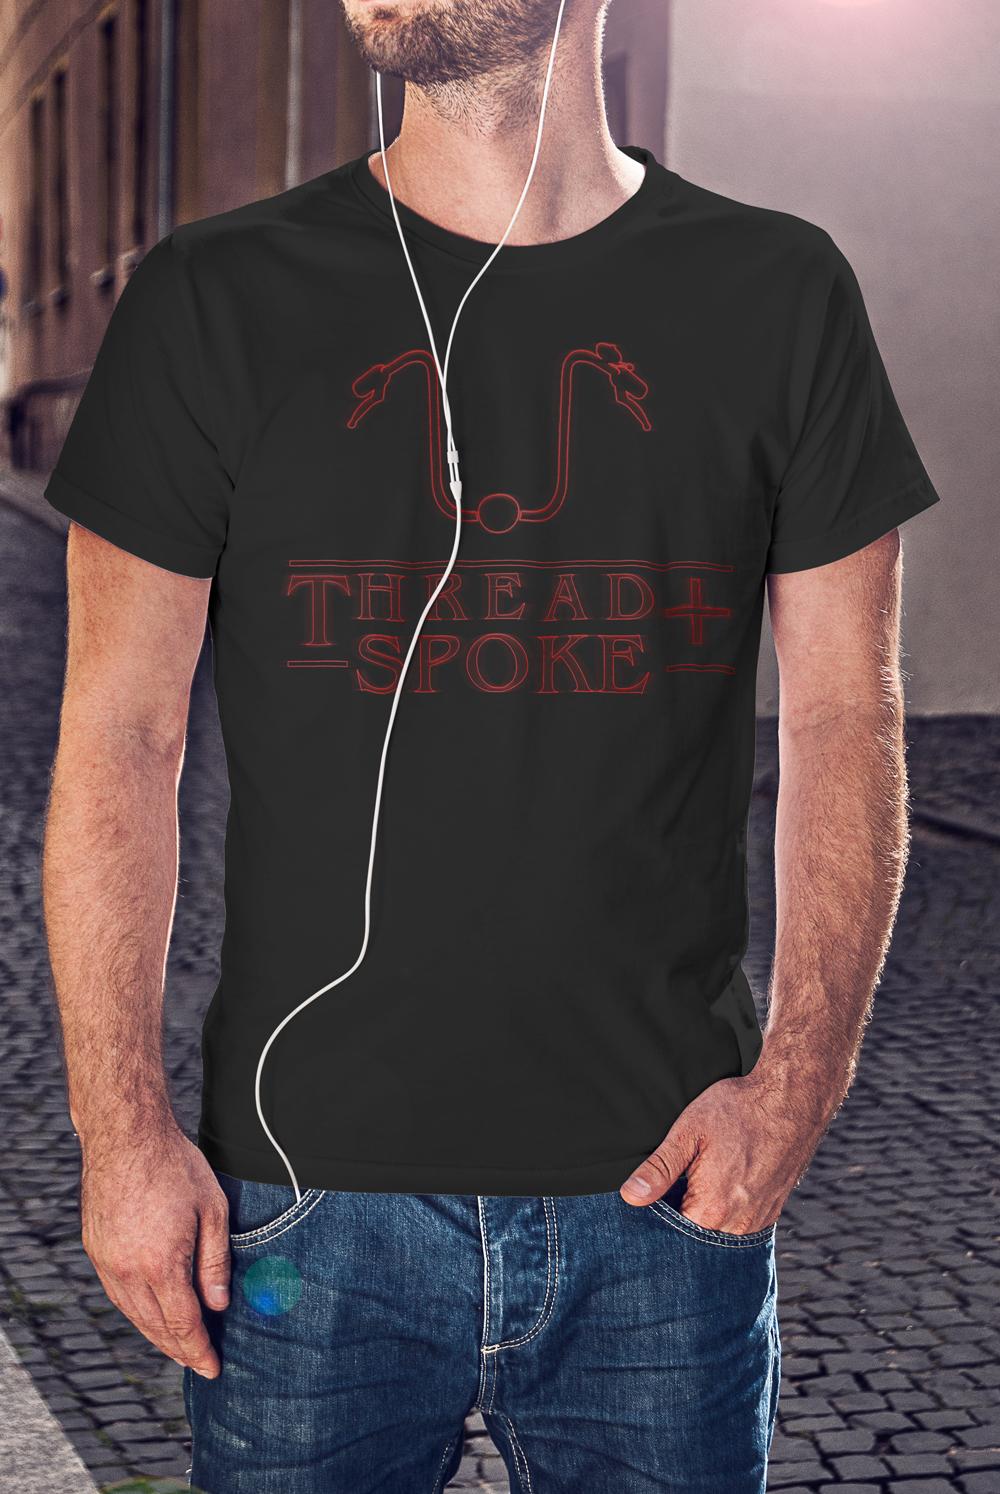 Thread + Spoke T-Shirts